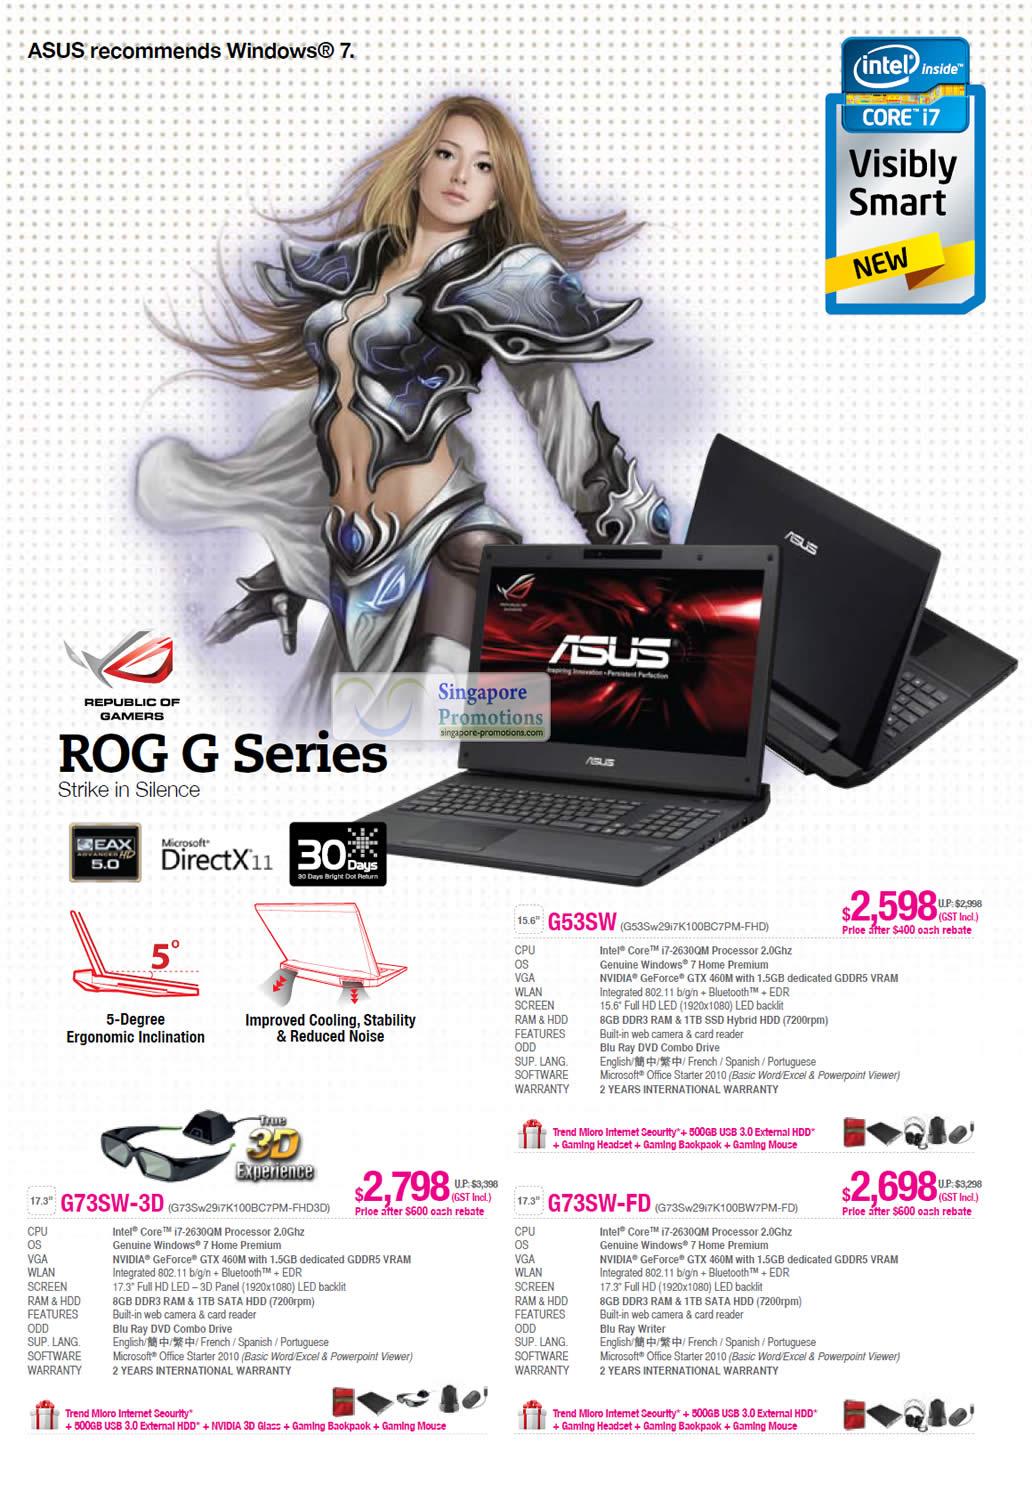 ROG G Series G53SW G53Sw29i7K100BC7PM-FHD G73SW-3D G73Sw29i7K100BC7PM-FHD3D G73SW-FD F73Sw29i7K100BW7PM-FD